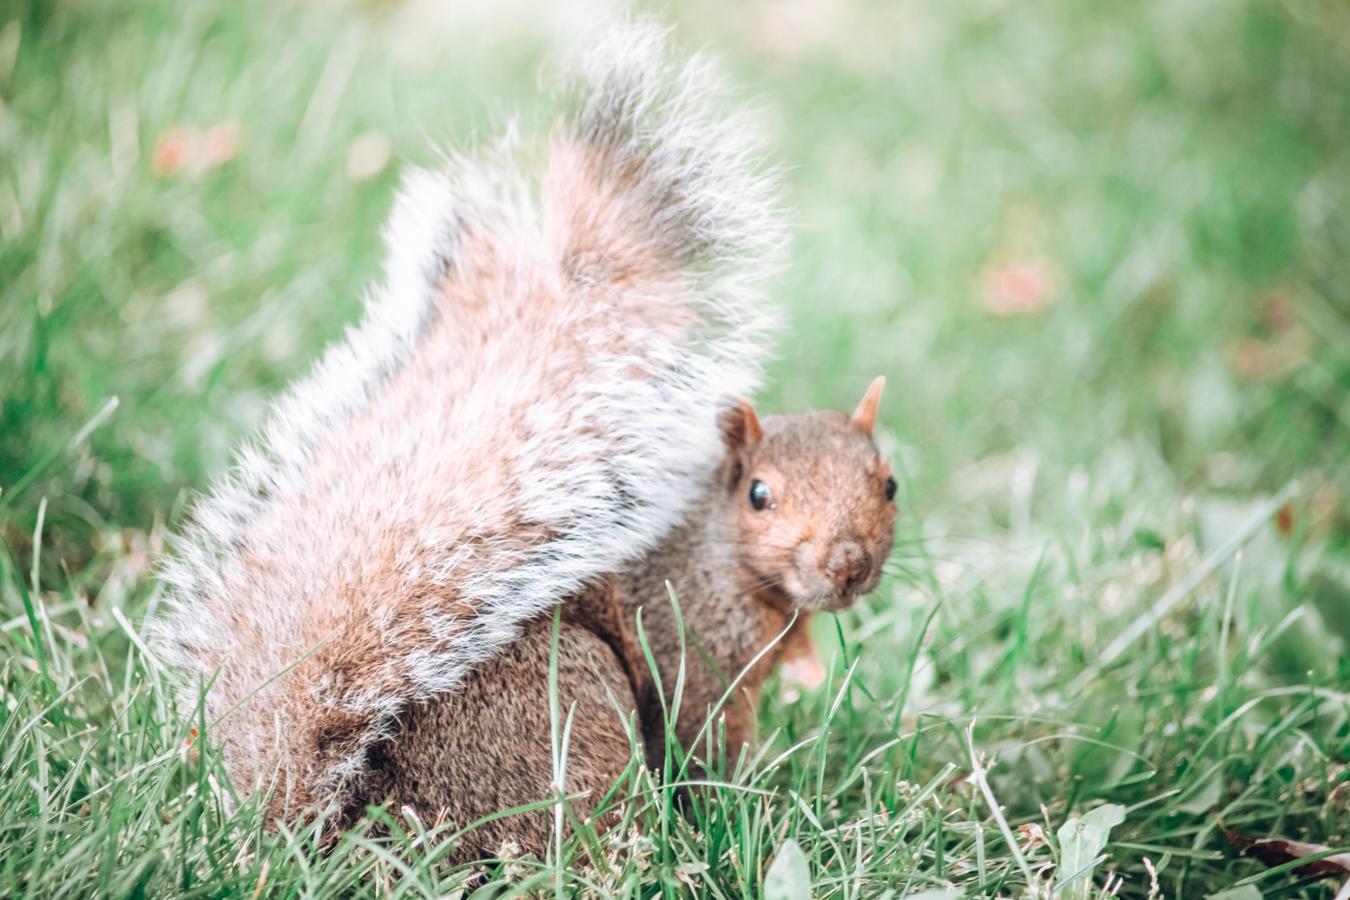 Squirrel in La Fontaine Park